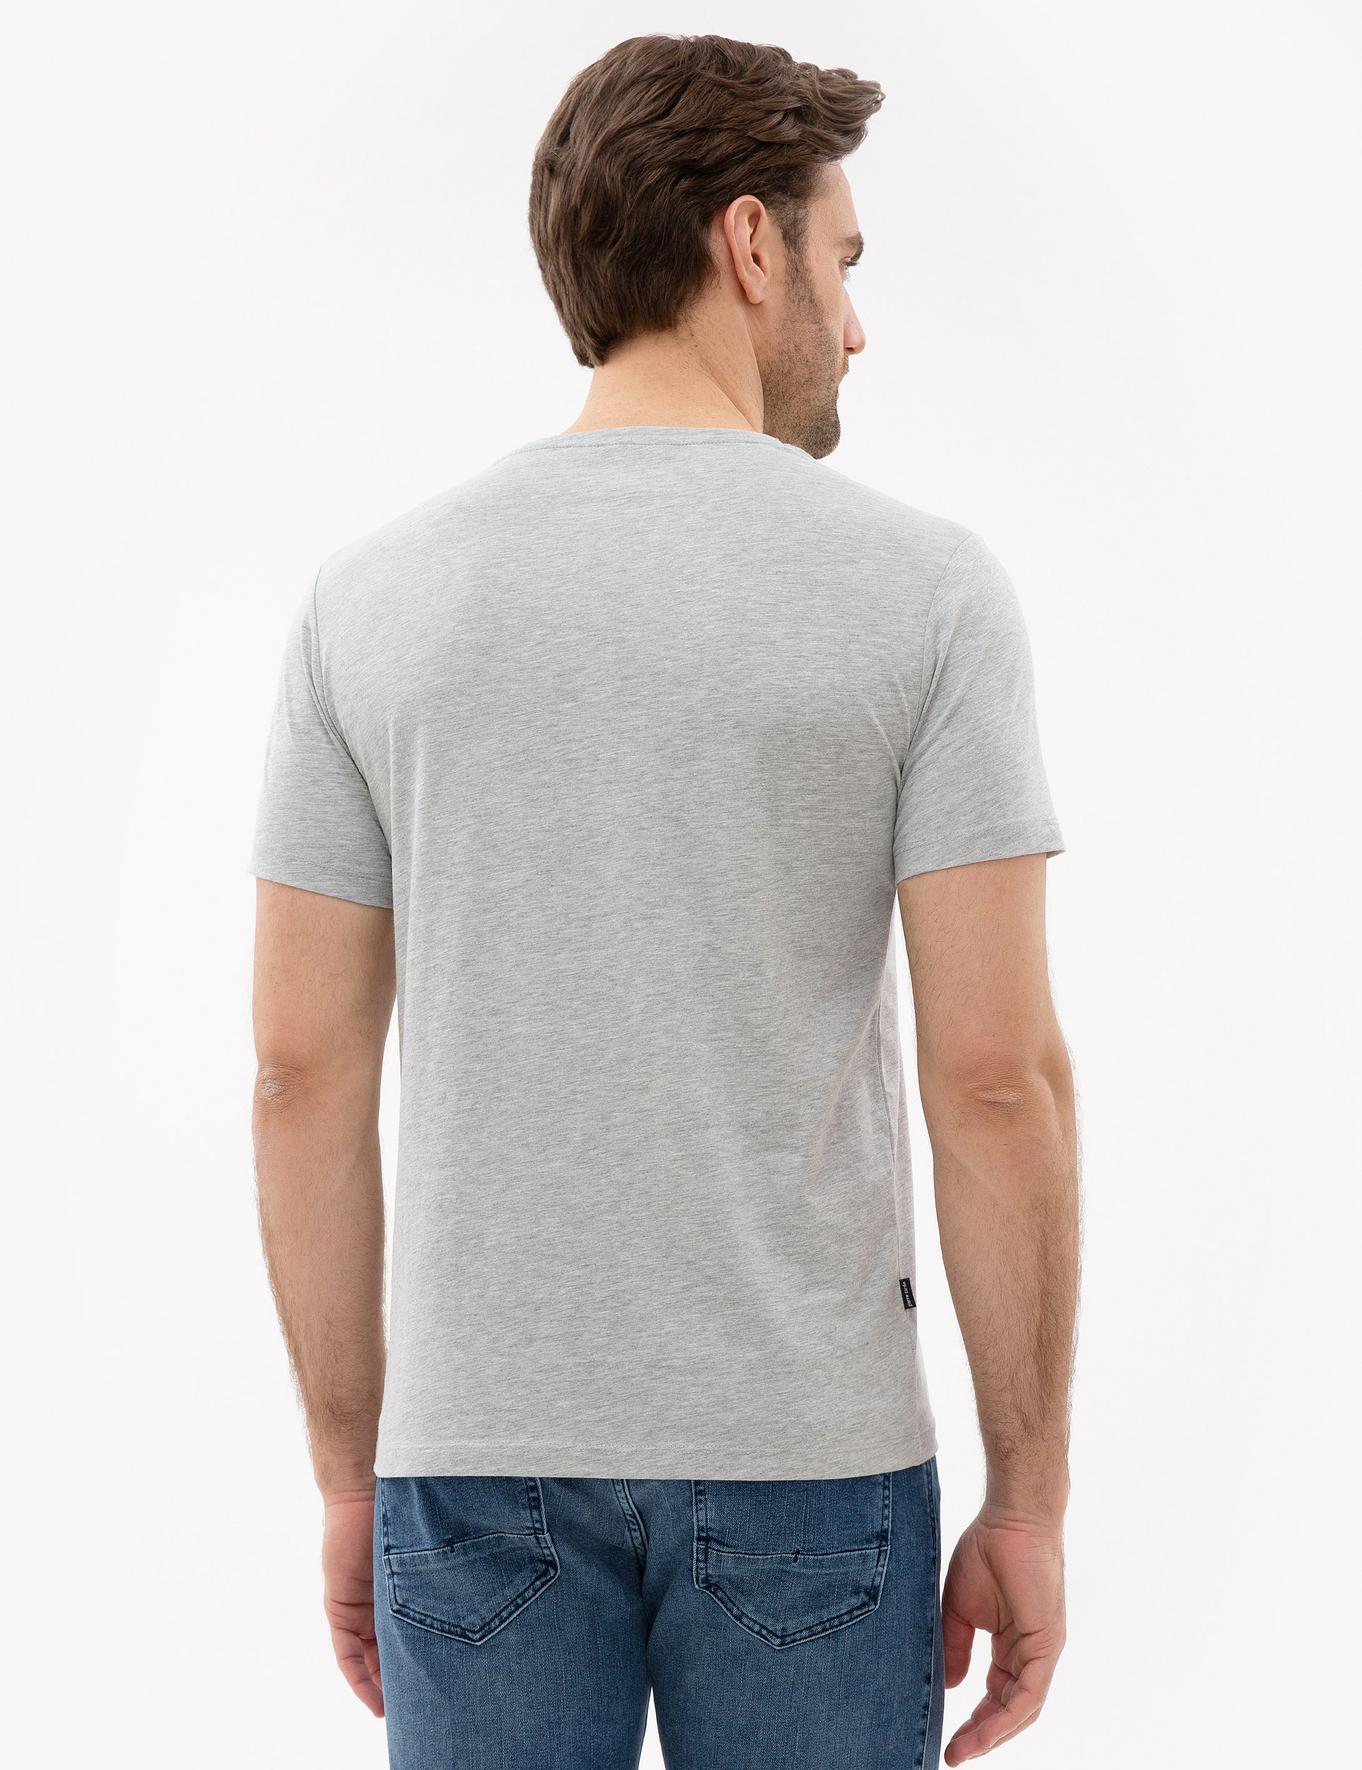 Açık Gri Melanj Slim Fit T-Shirt